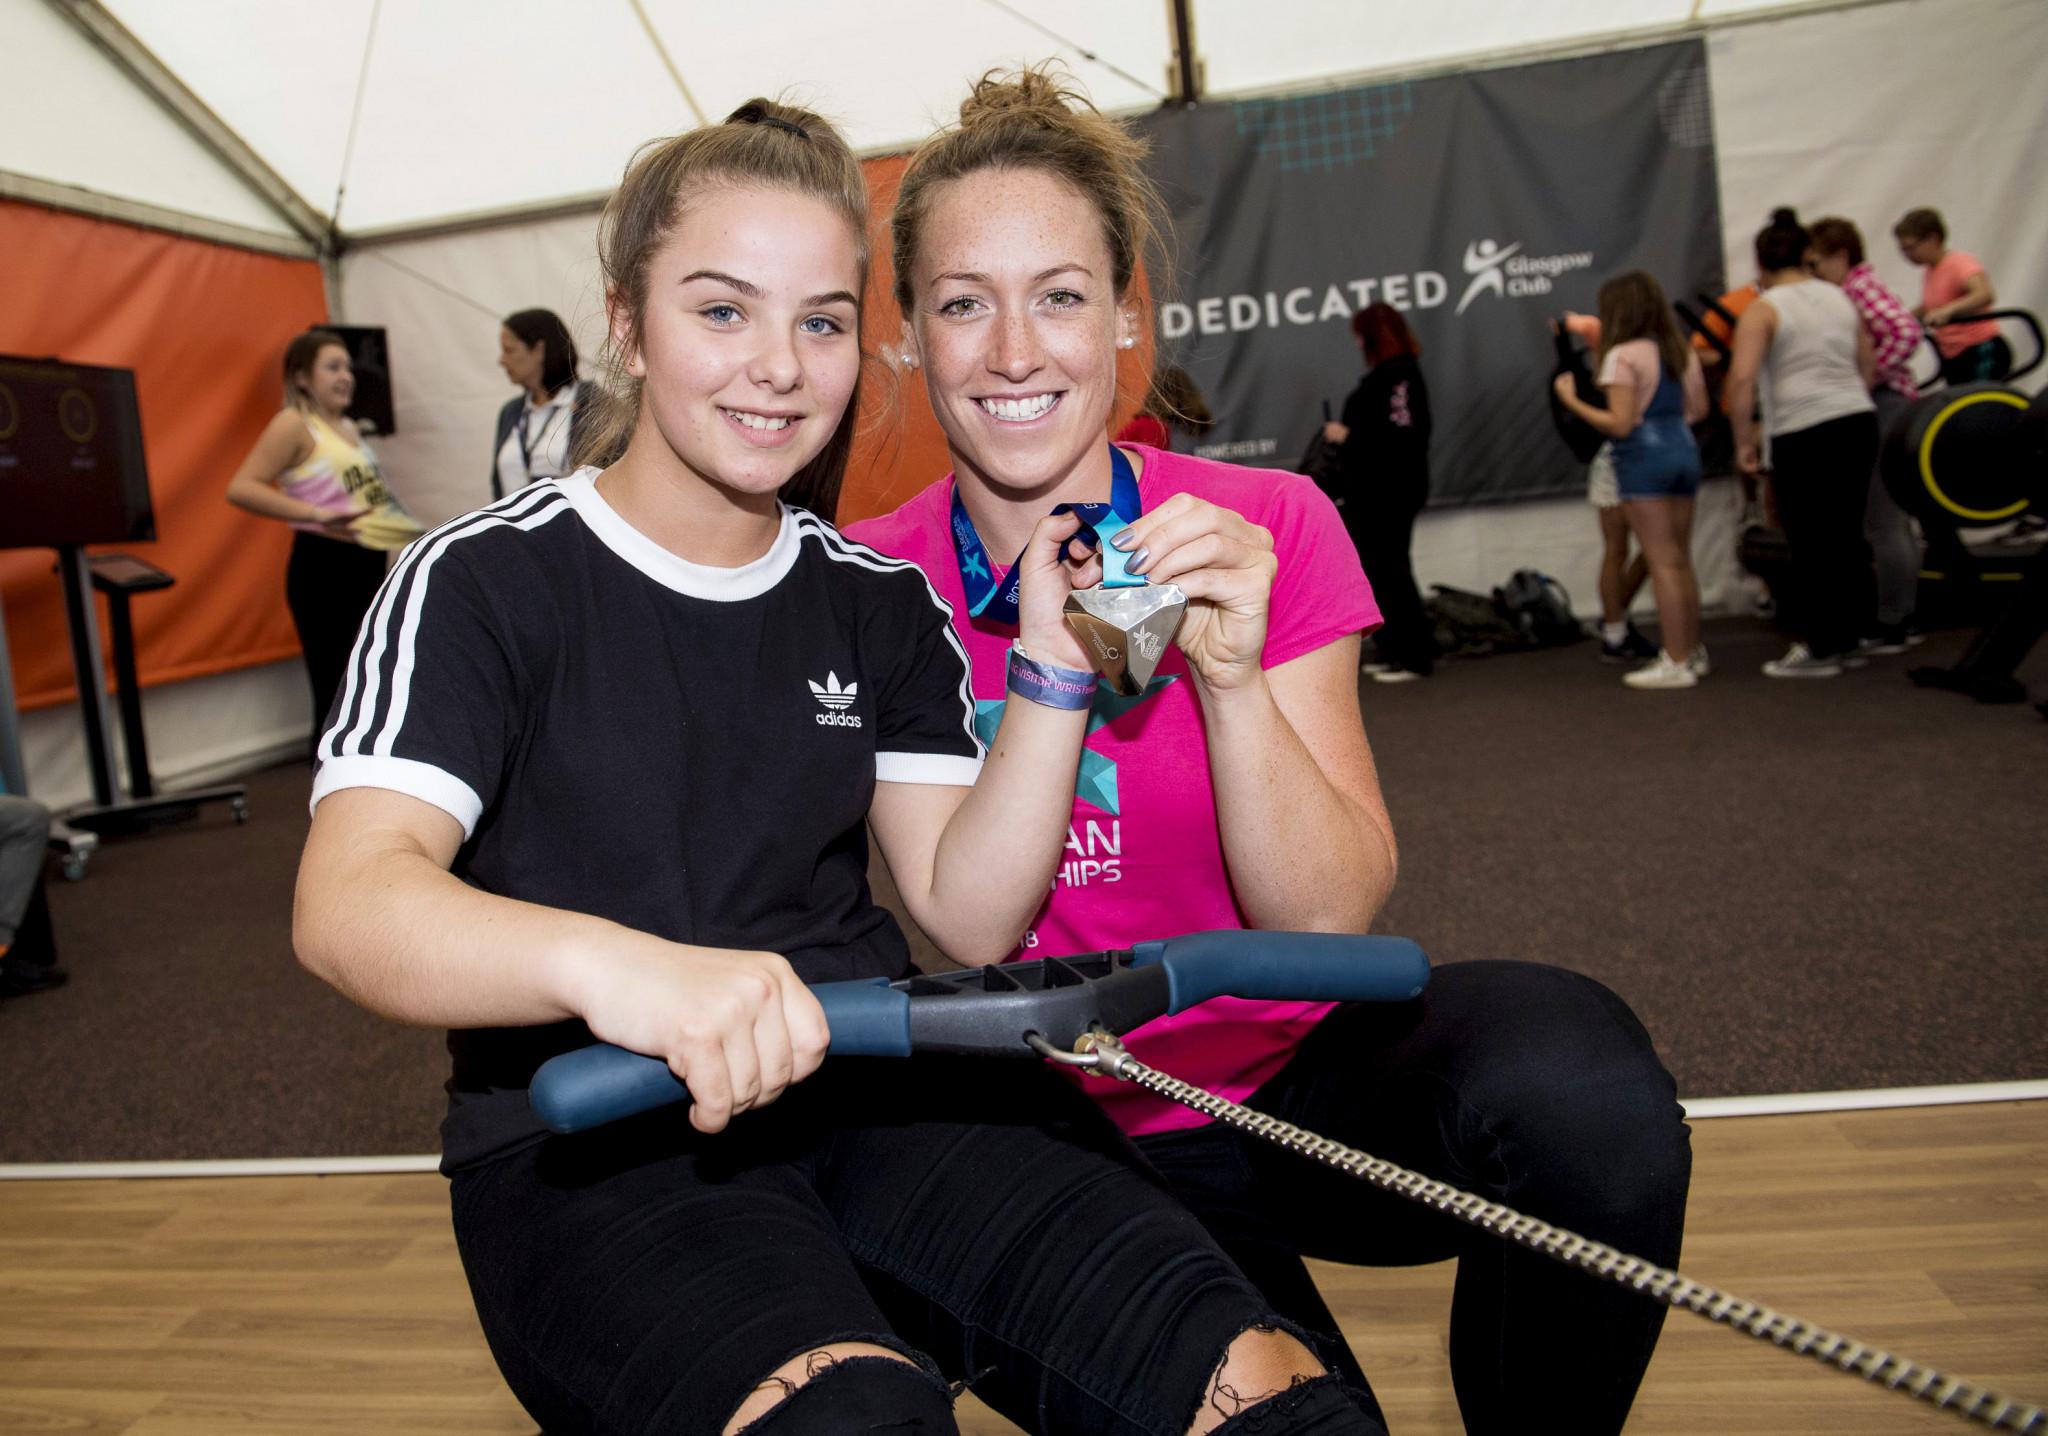 Rower Karen Bennett showed her women's eight medal off at the